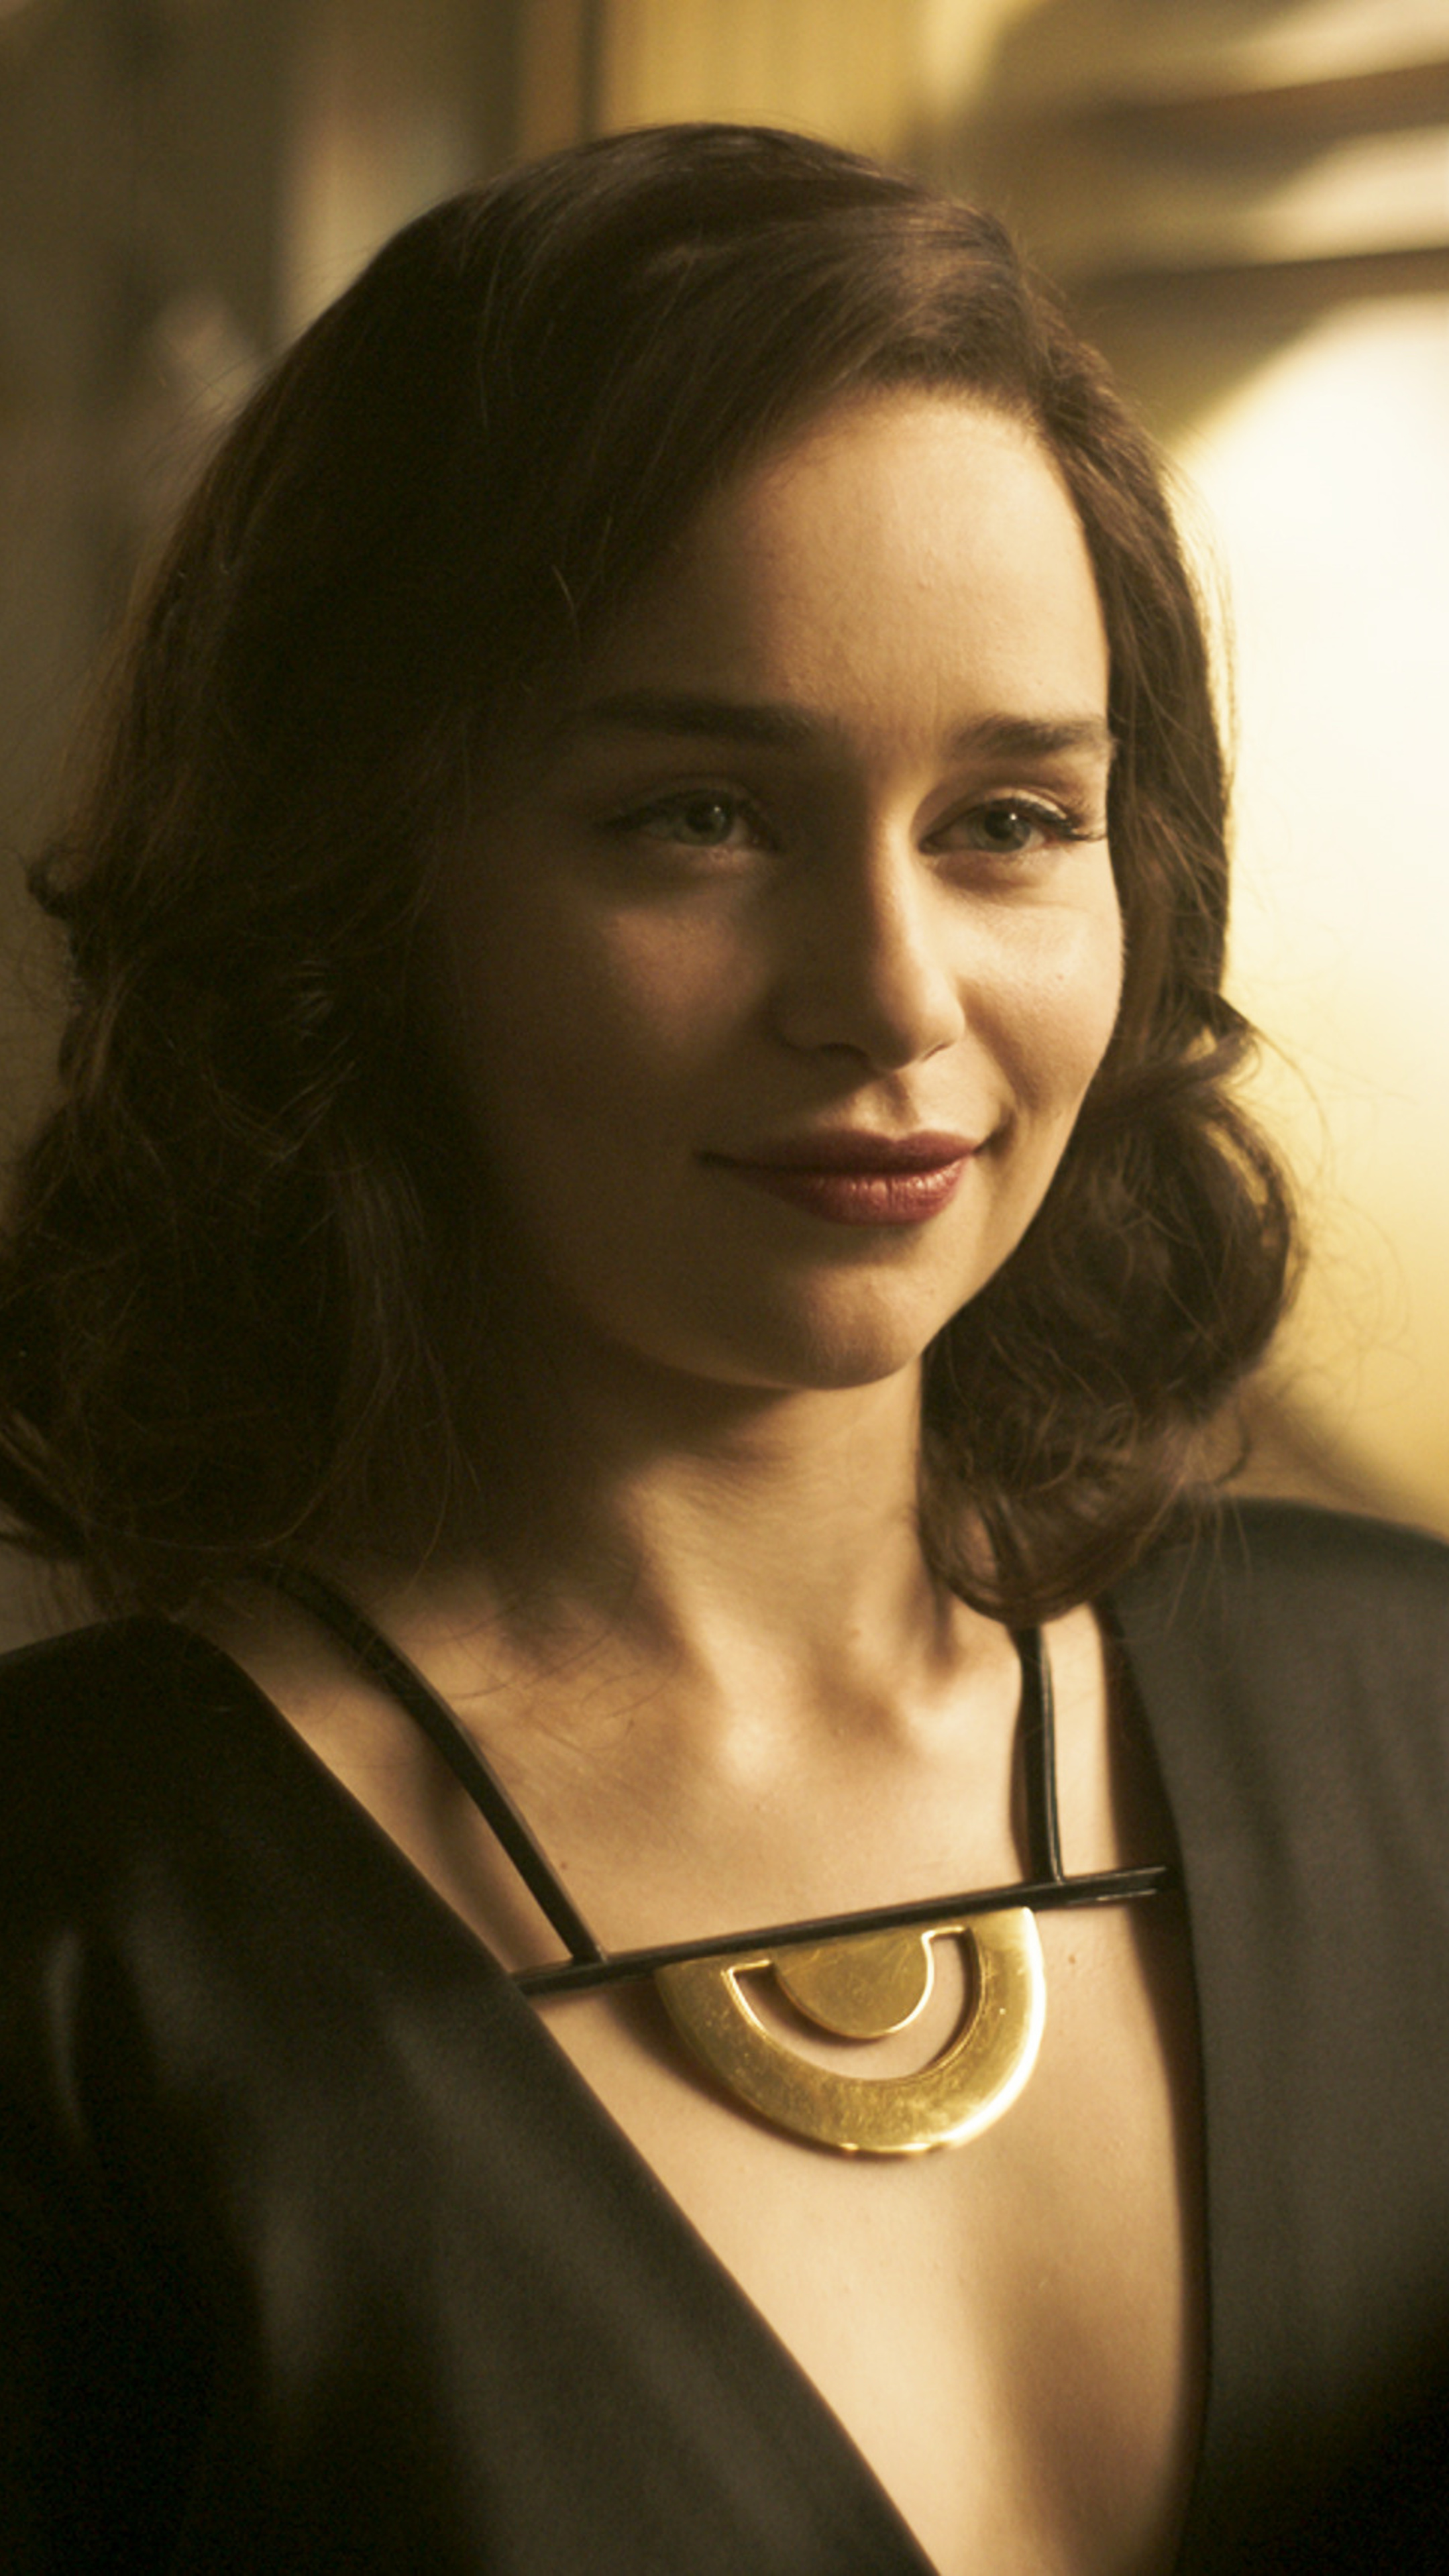 2160x3840 Emilia Clarke Photoshoot For Dolce And Gabbana